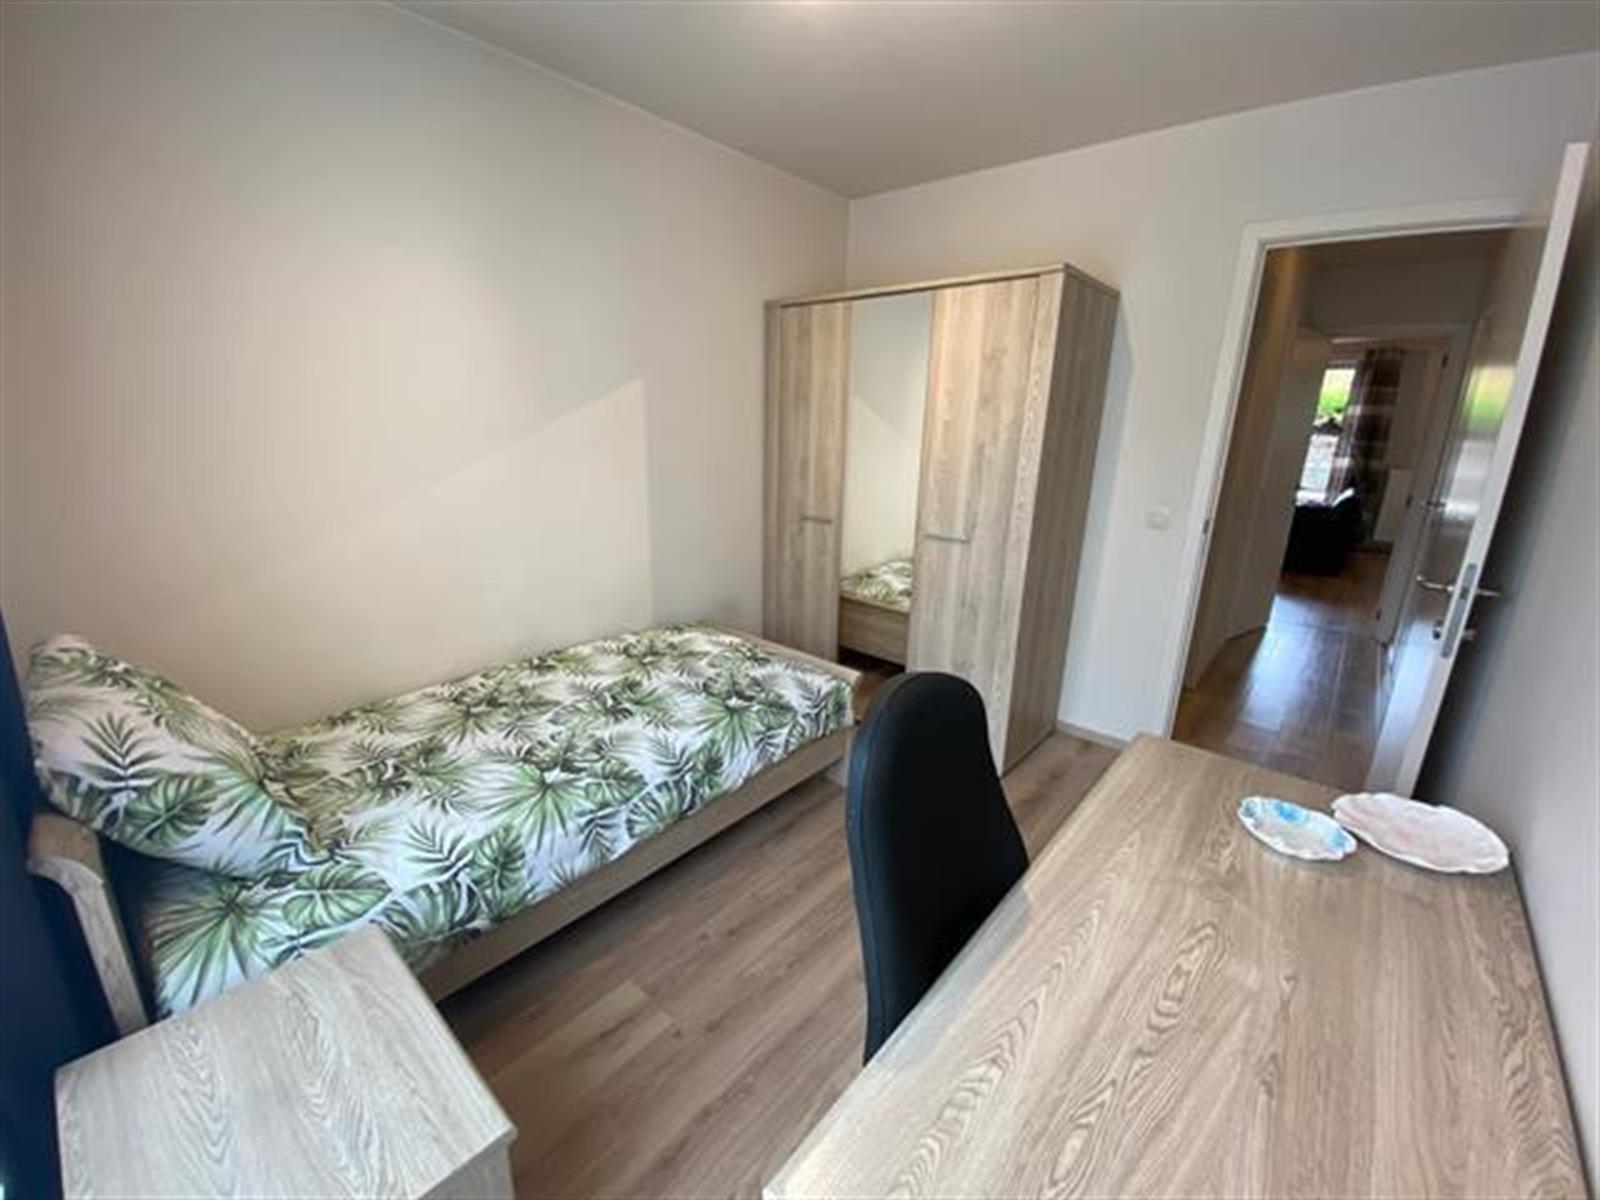 Flat - Etterbeek - #4074391-6